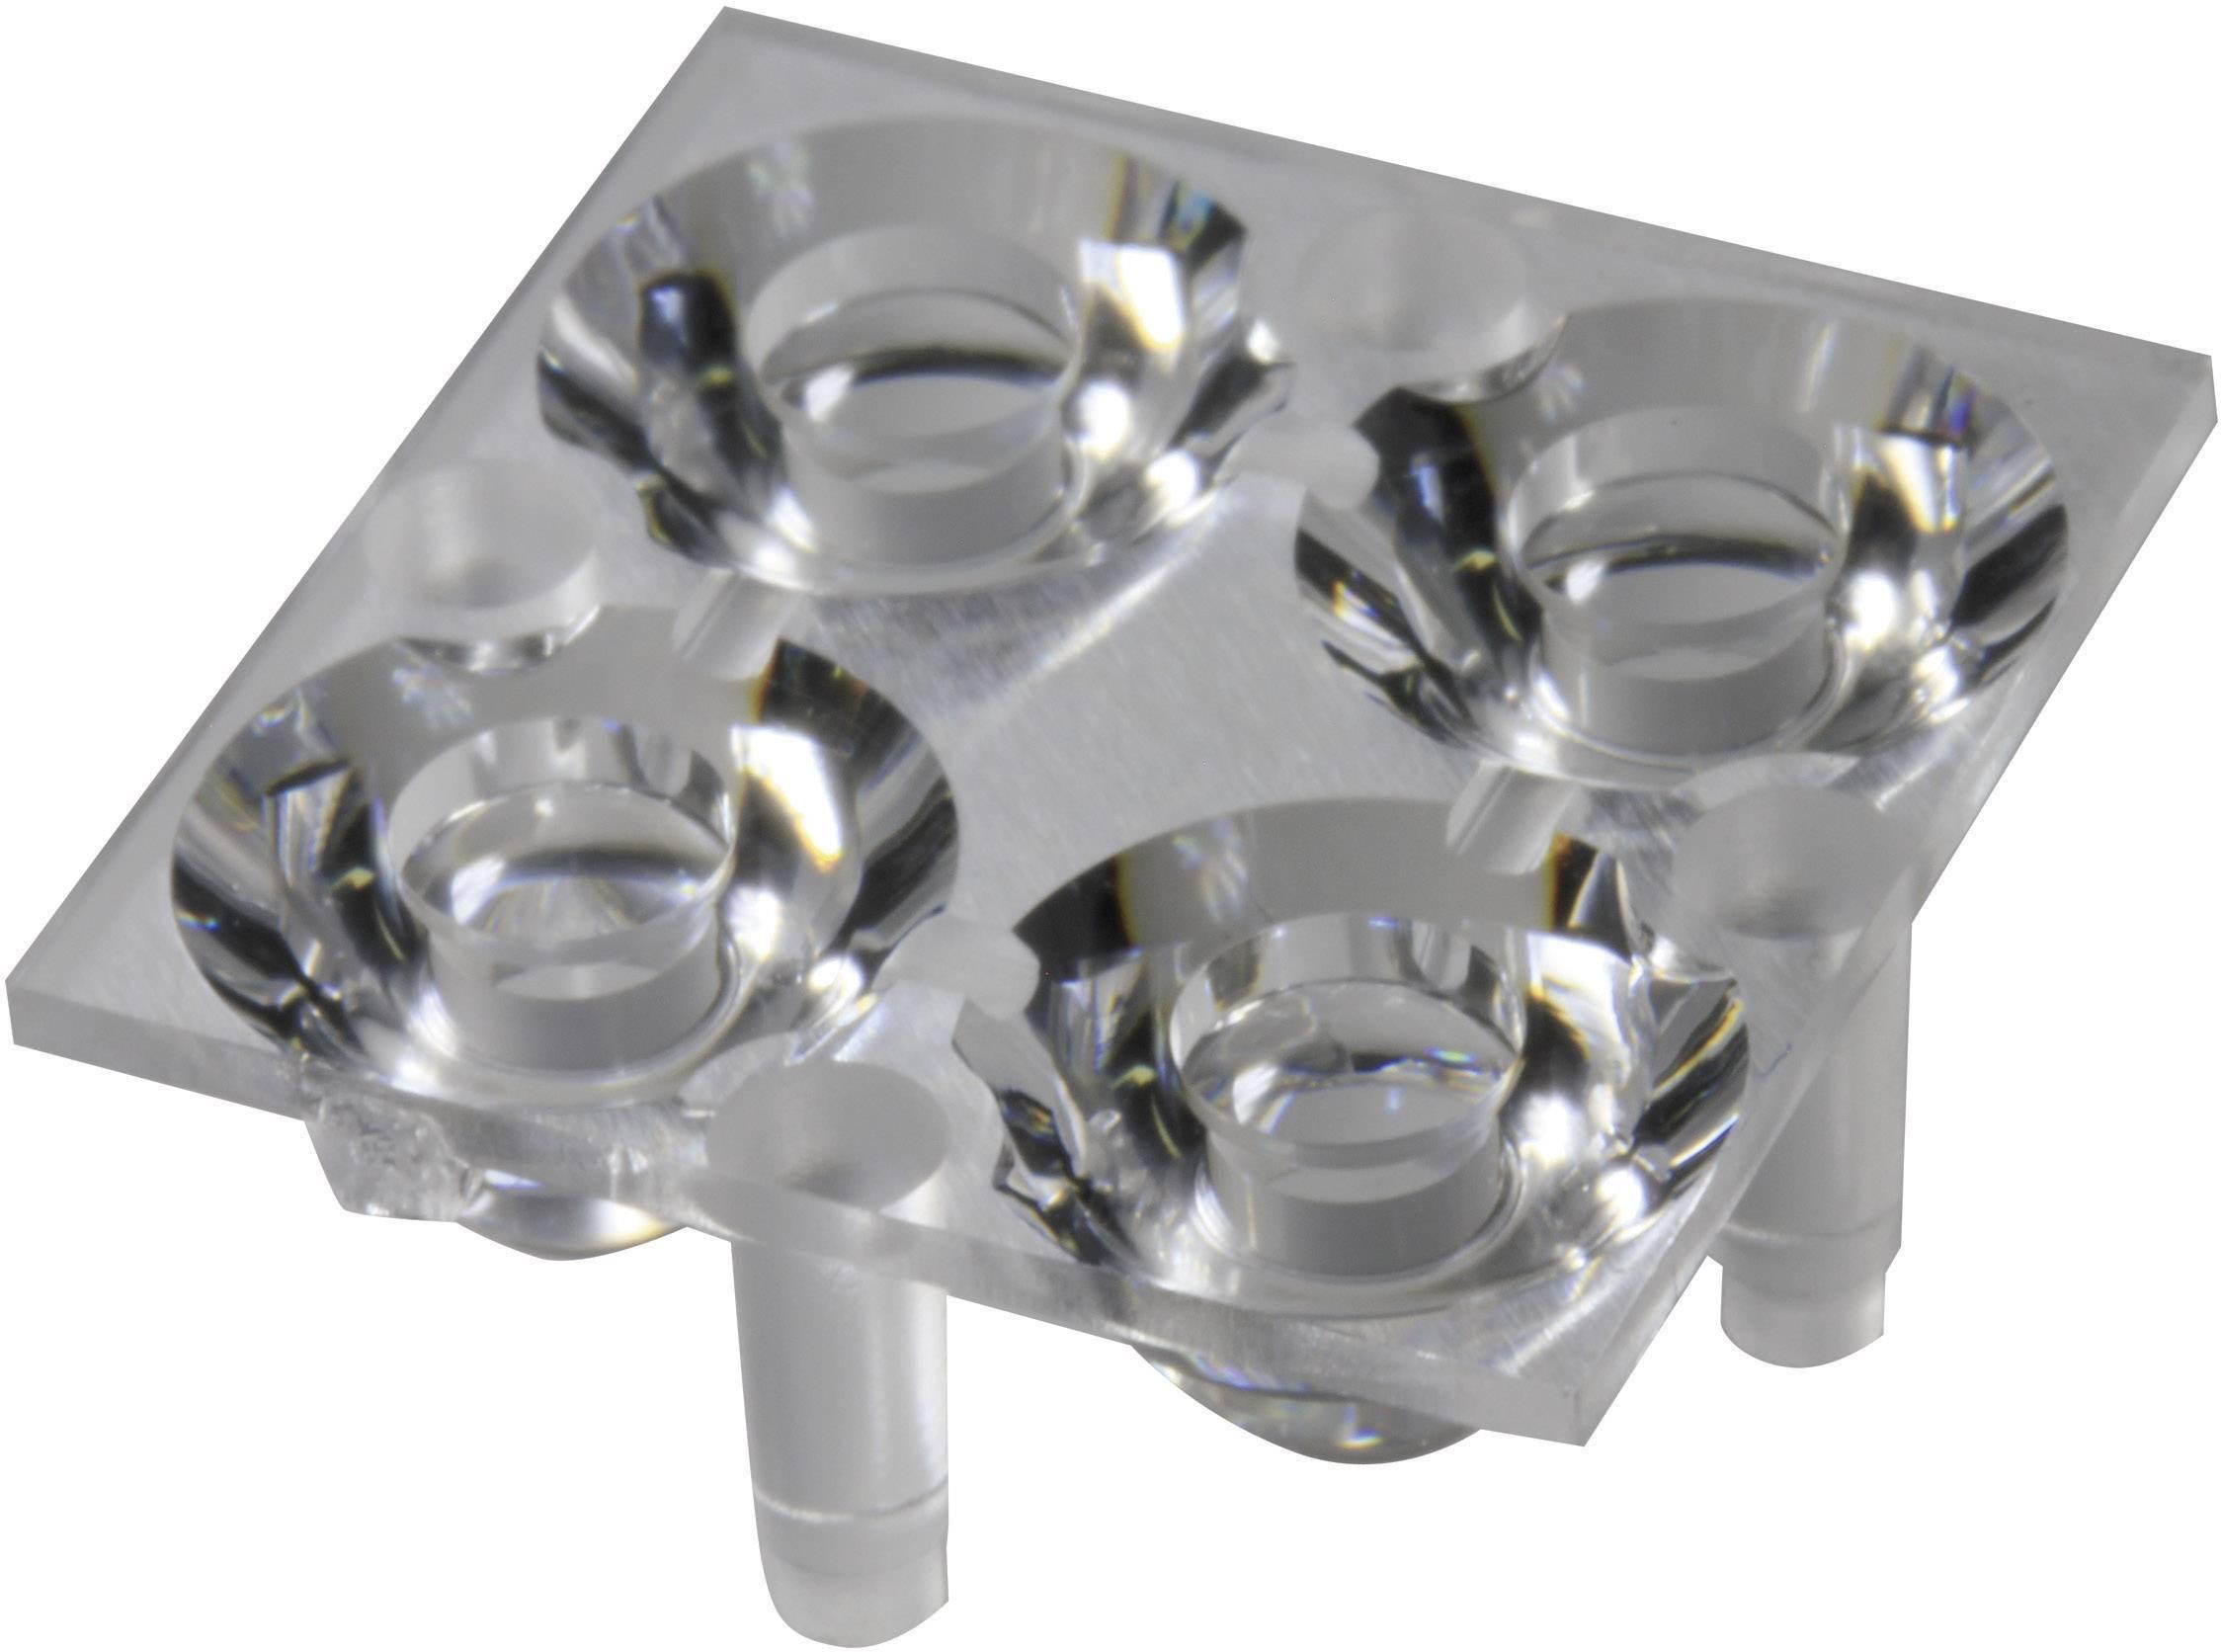 Optika pro Luxeon ® Rebel nebo Seoul Semiconductor ® Z5 Carclo 10610, 16.2°